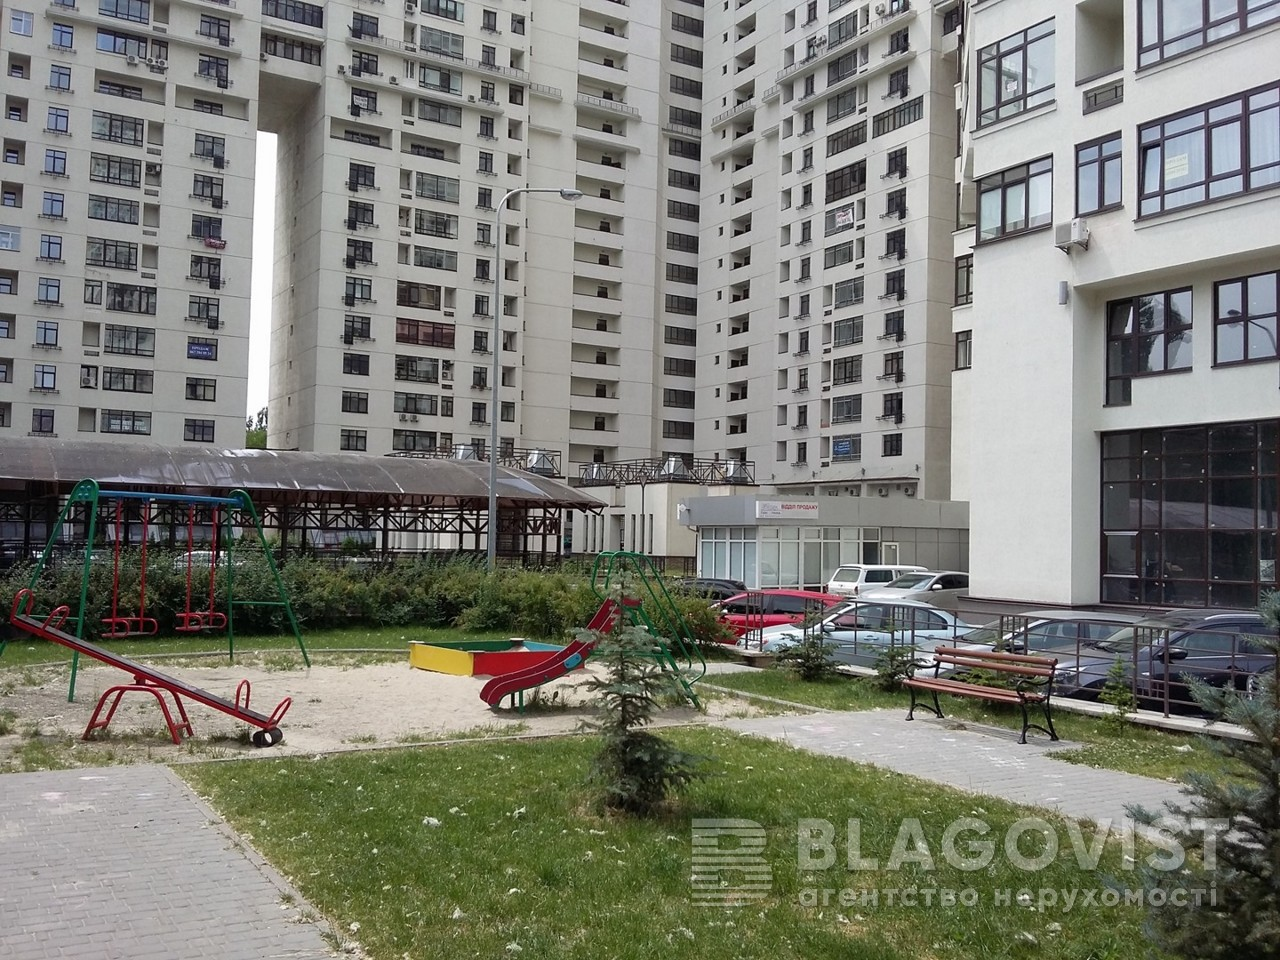 Нежитлове приміщення, H-34490, Коновальця Євгена (Щорса), Київ - Фото 15